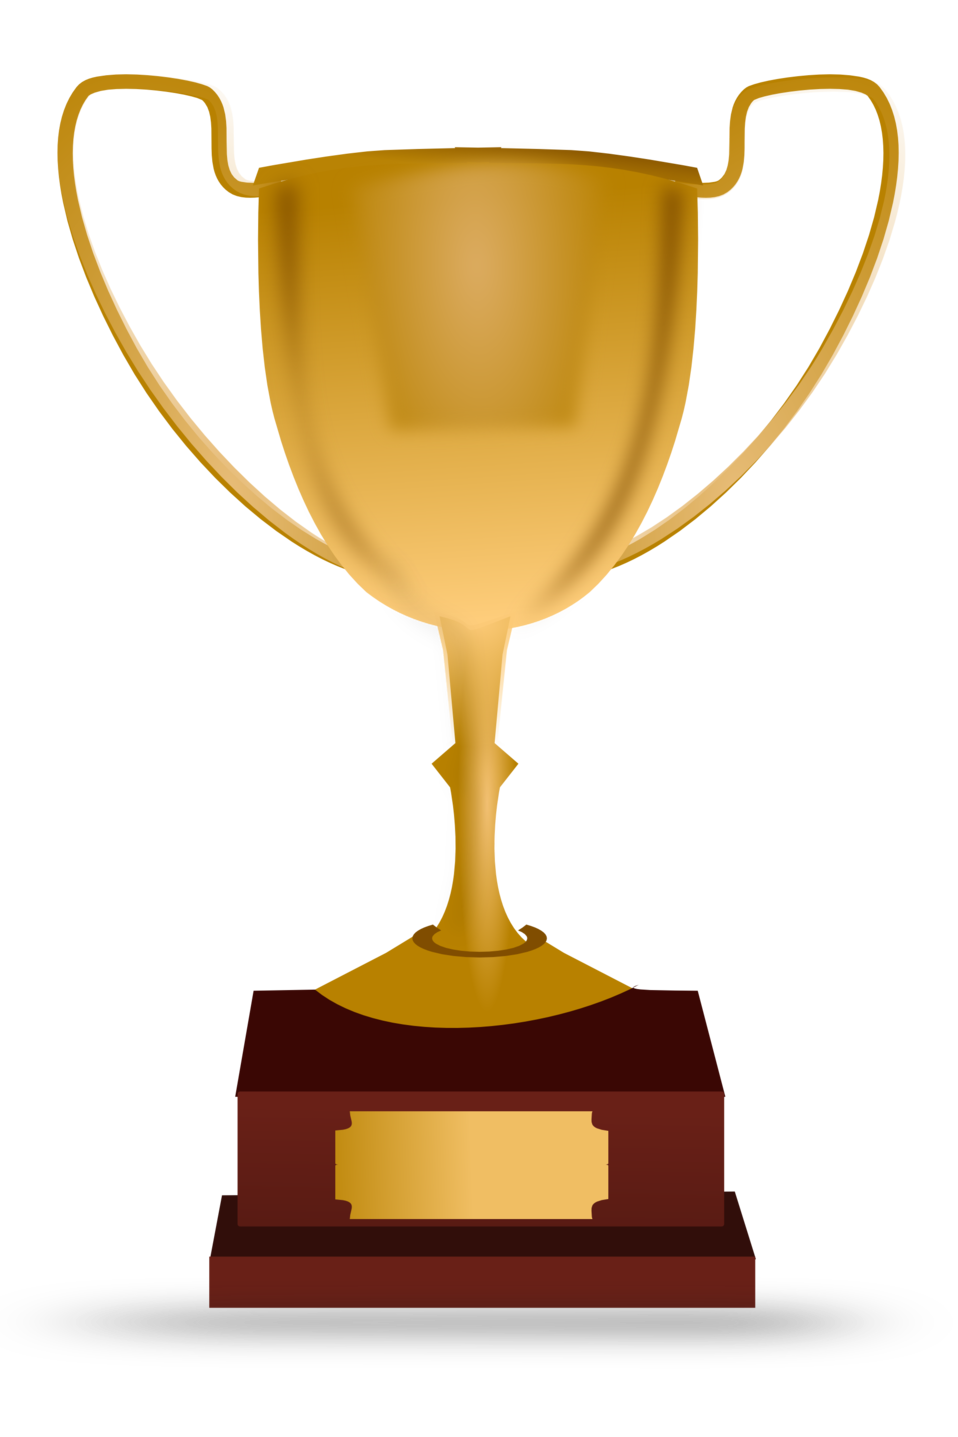 public domain clip art image trophy id 13929502217552 rh publicdomainfiles com trophy clipart images clip art trophies free